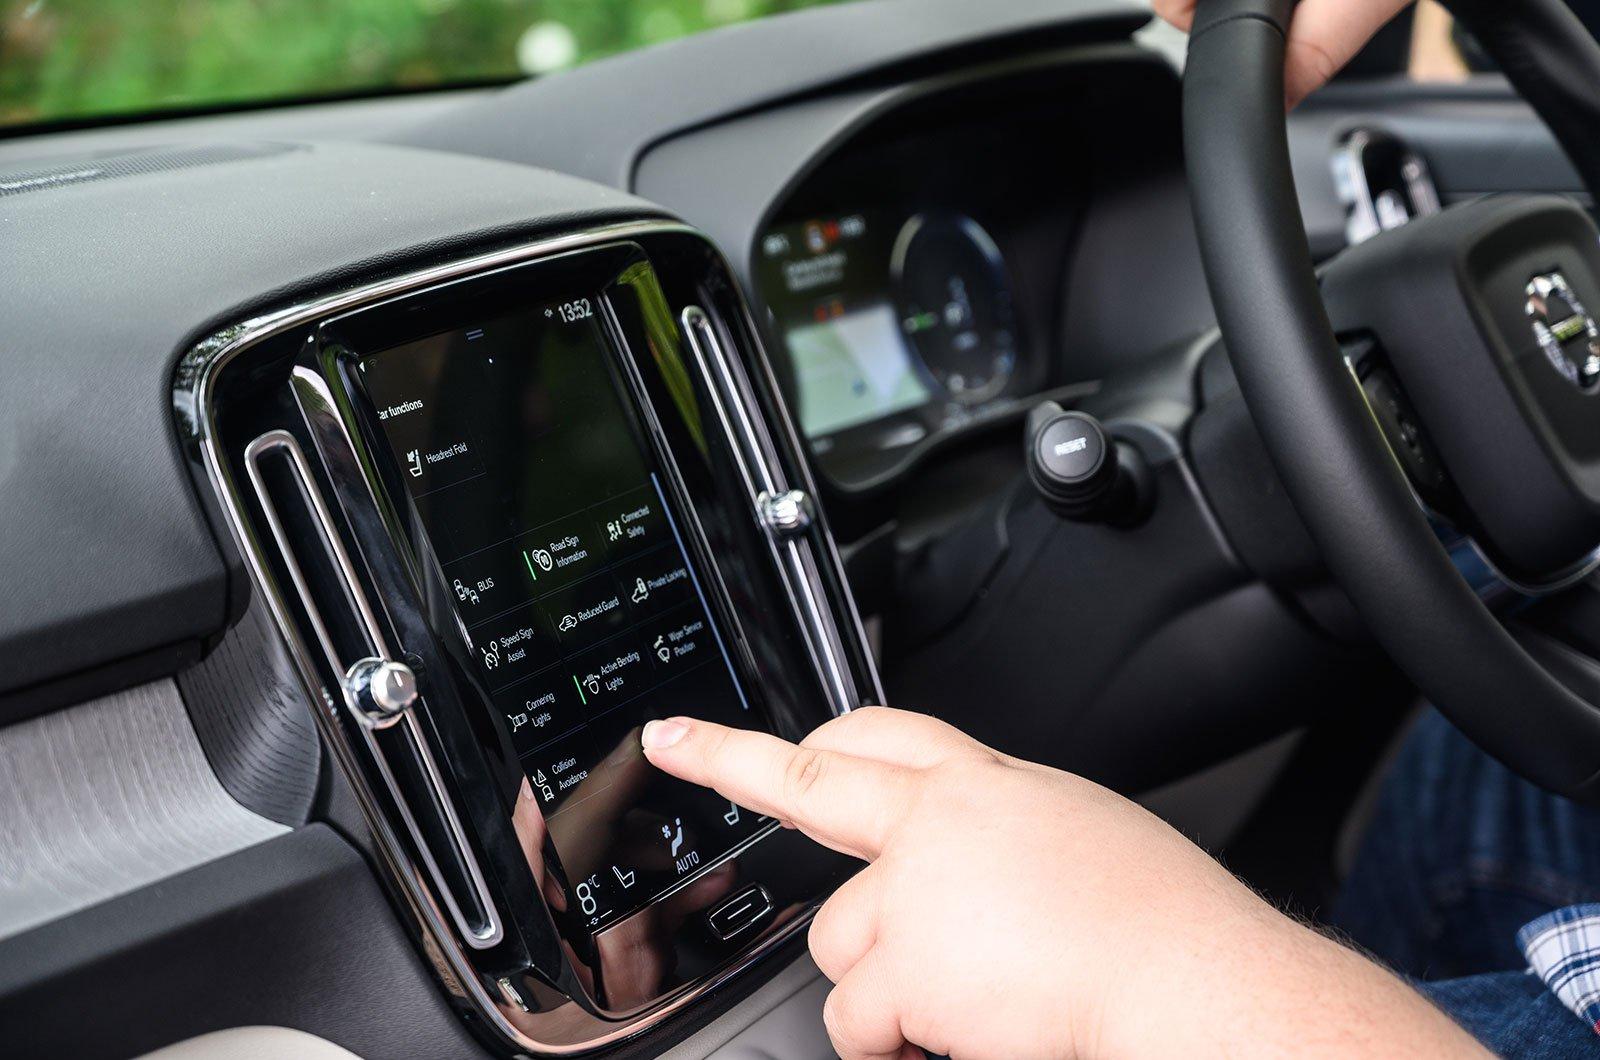 Volvo XC40 infotainment screen